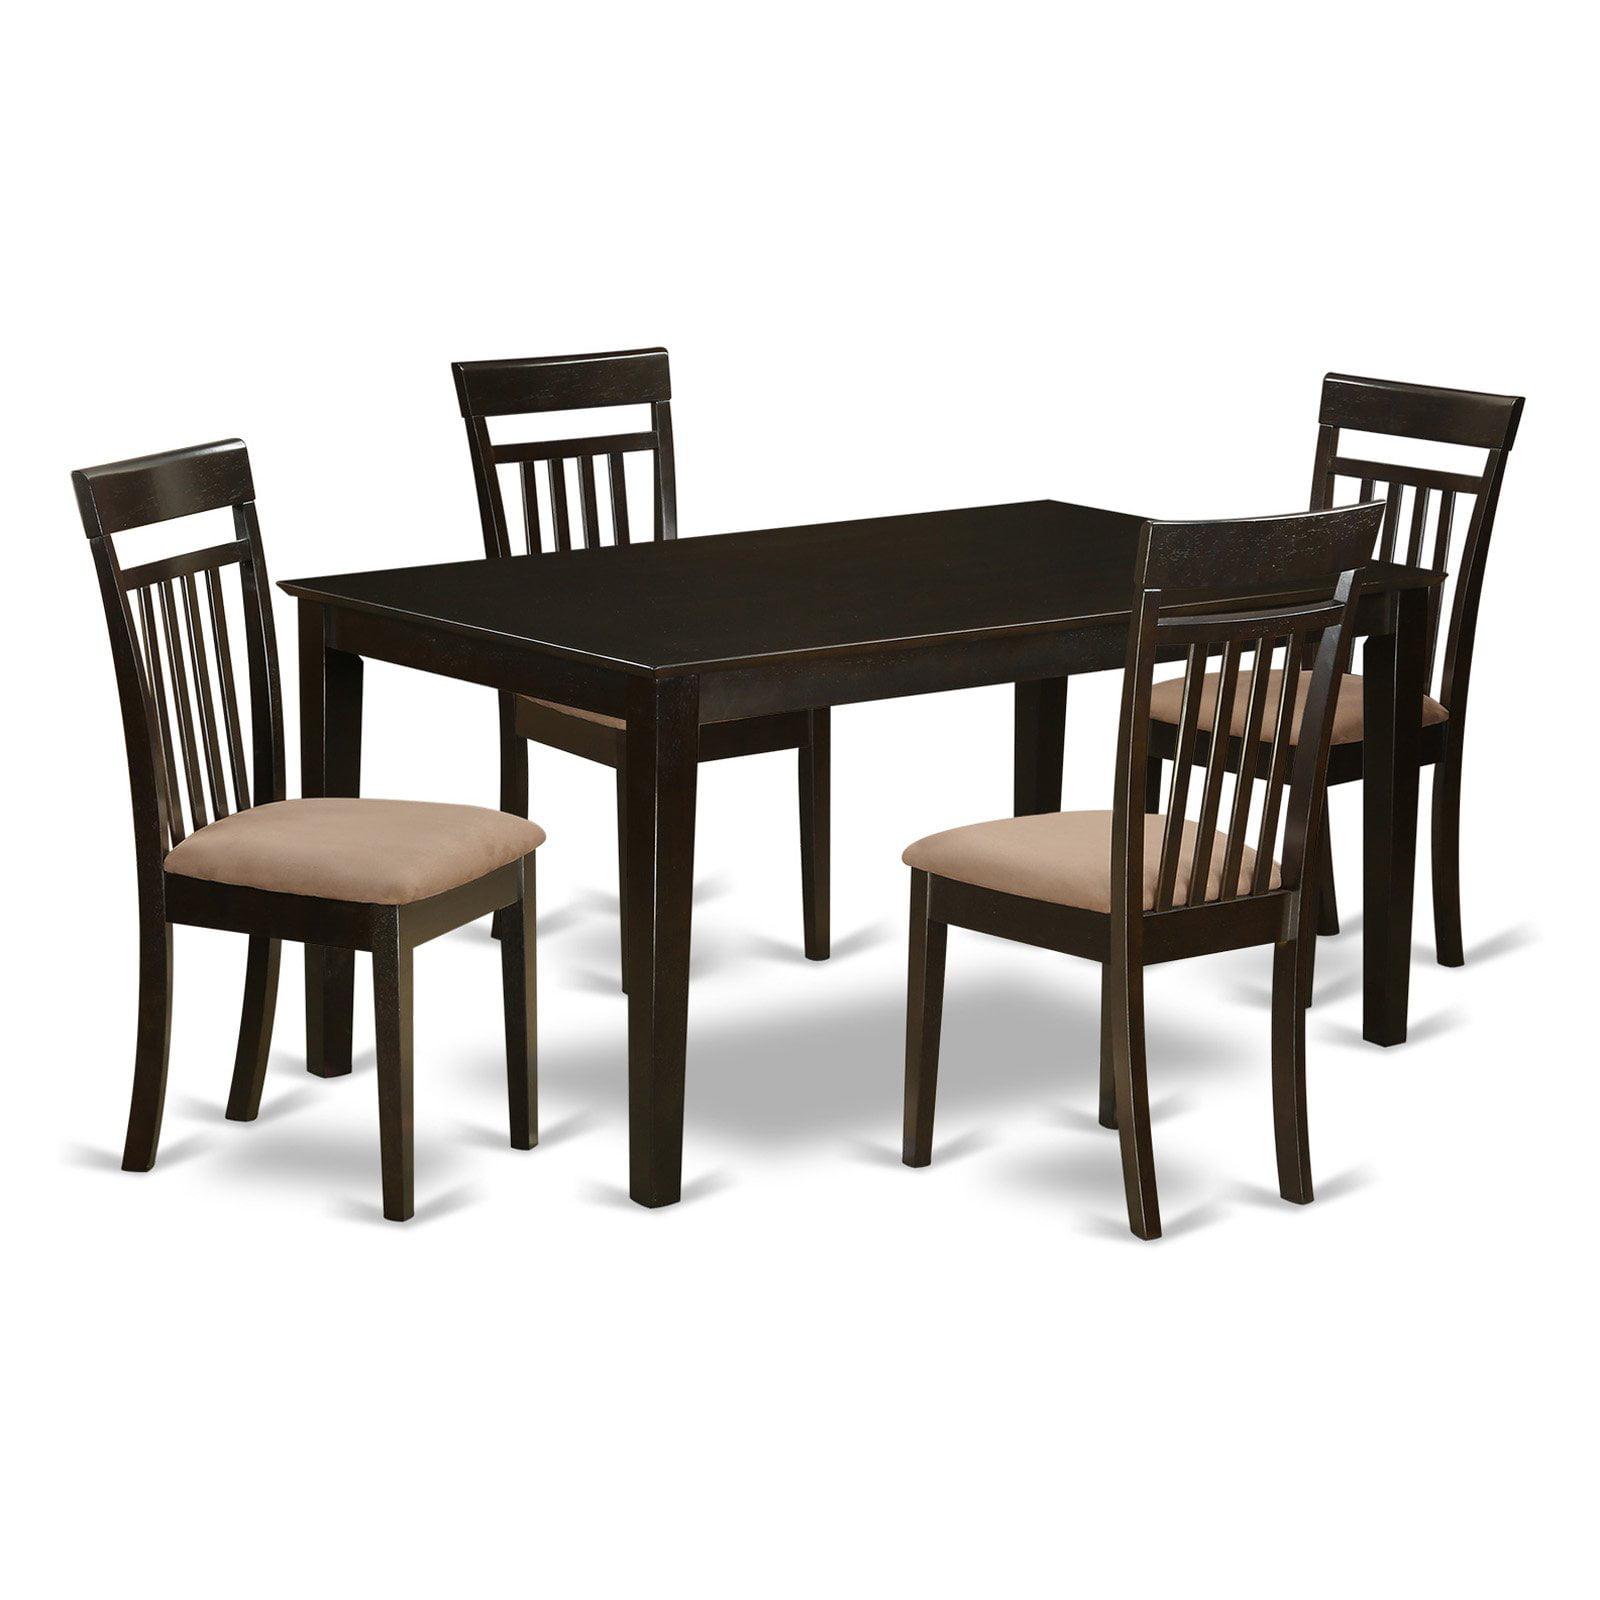 East West Furniture Capri 5 Piece Sheraton Dining Table Set